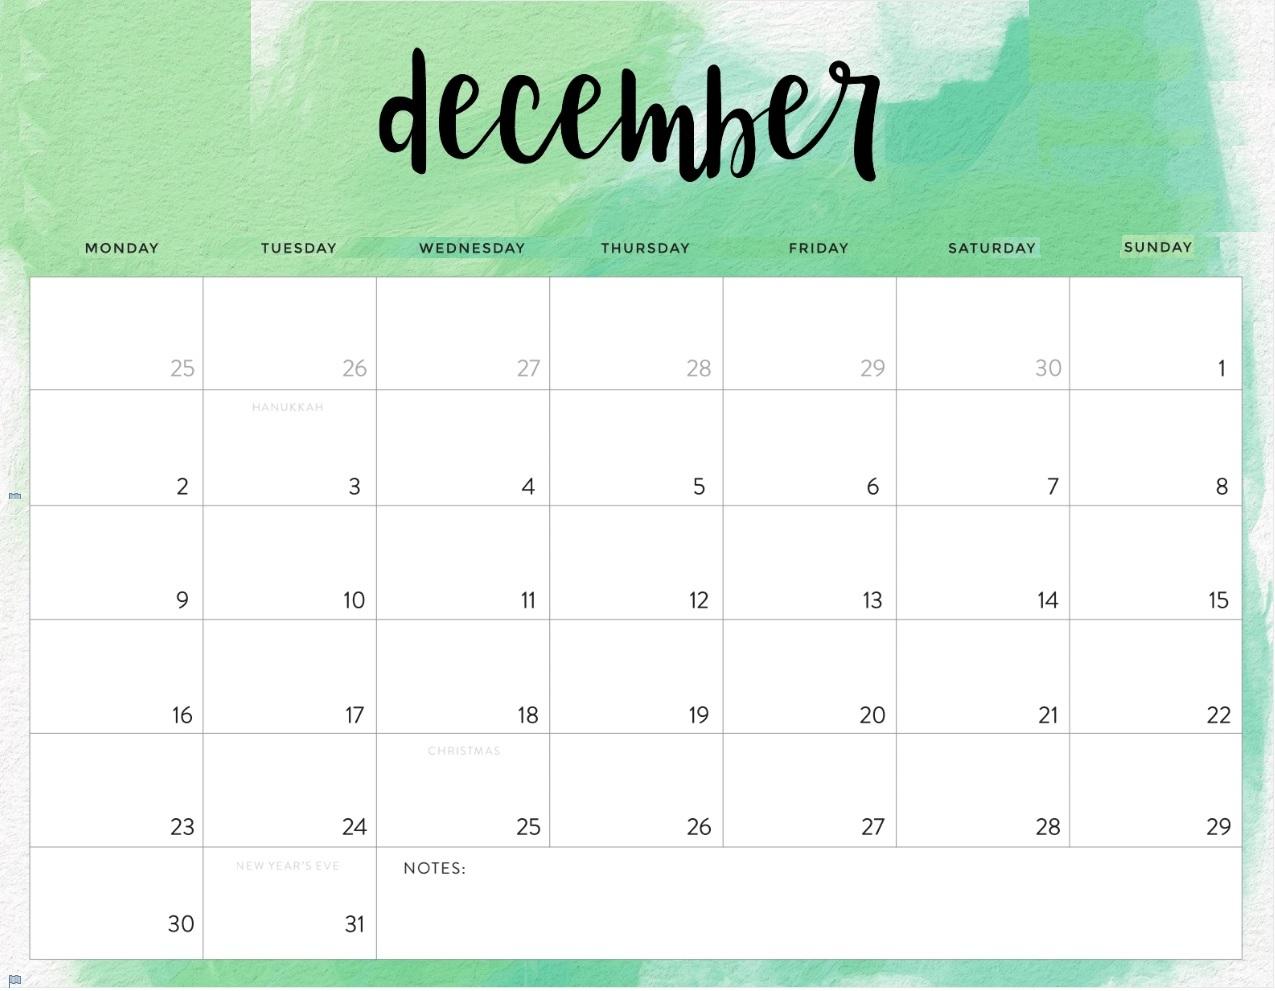 December 2019 Calendar Edit Online